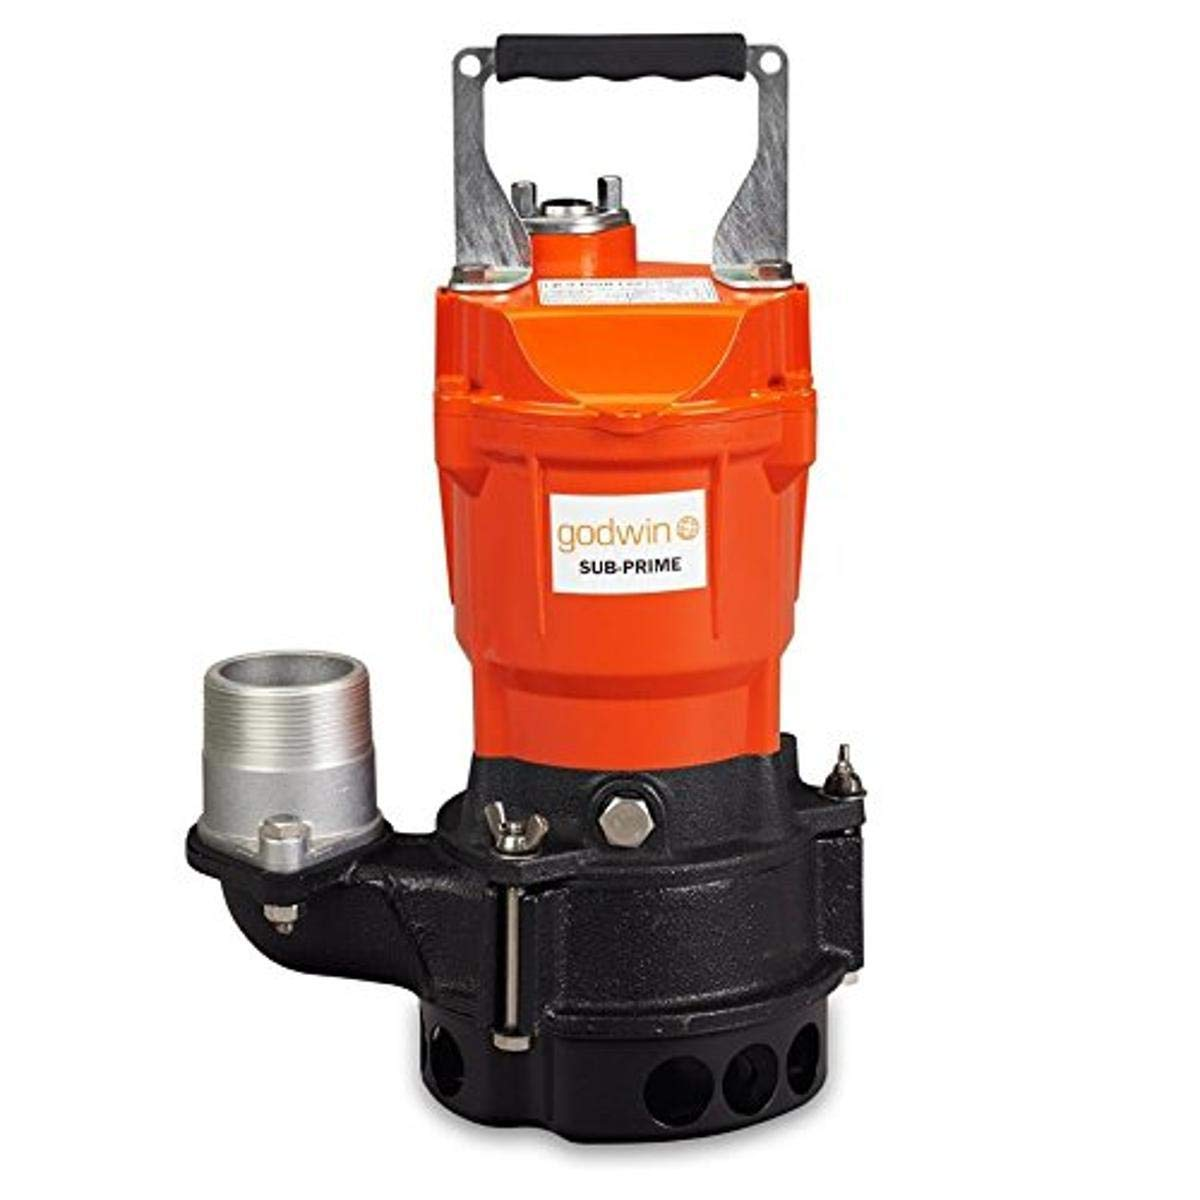 Single Phase 115V 2 Godwin GSP05-115V Series Submersible Dewatering Pump 1//2 hp